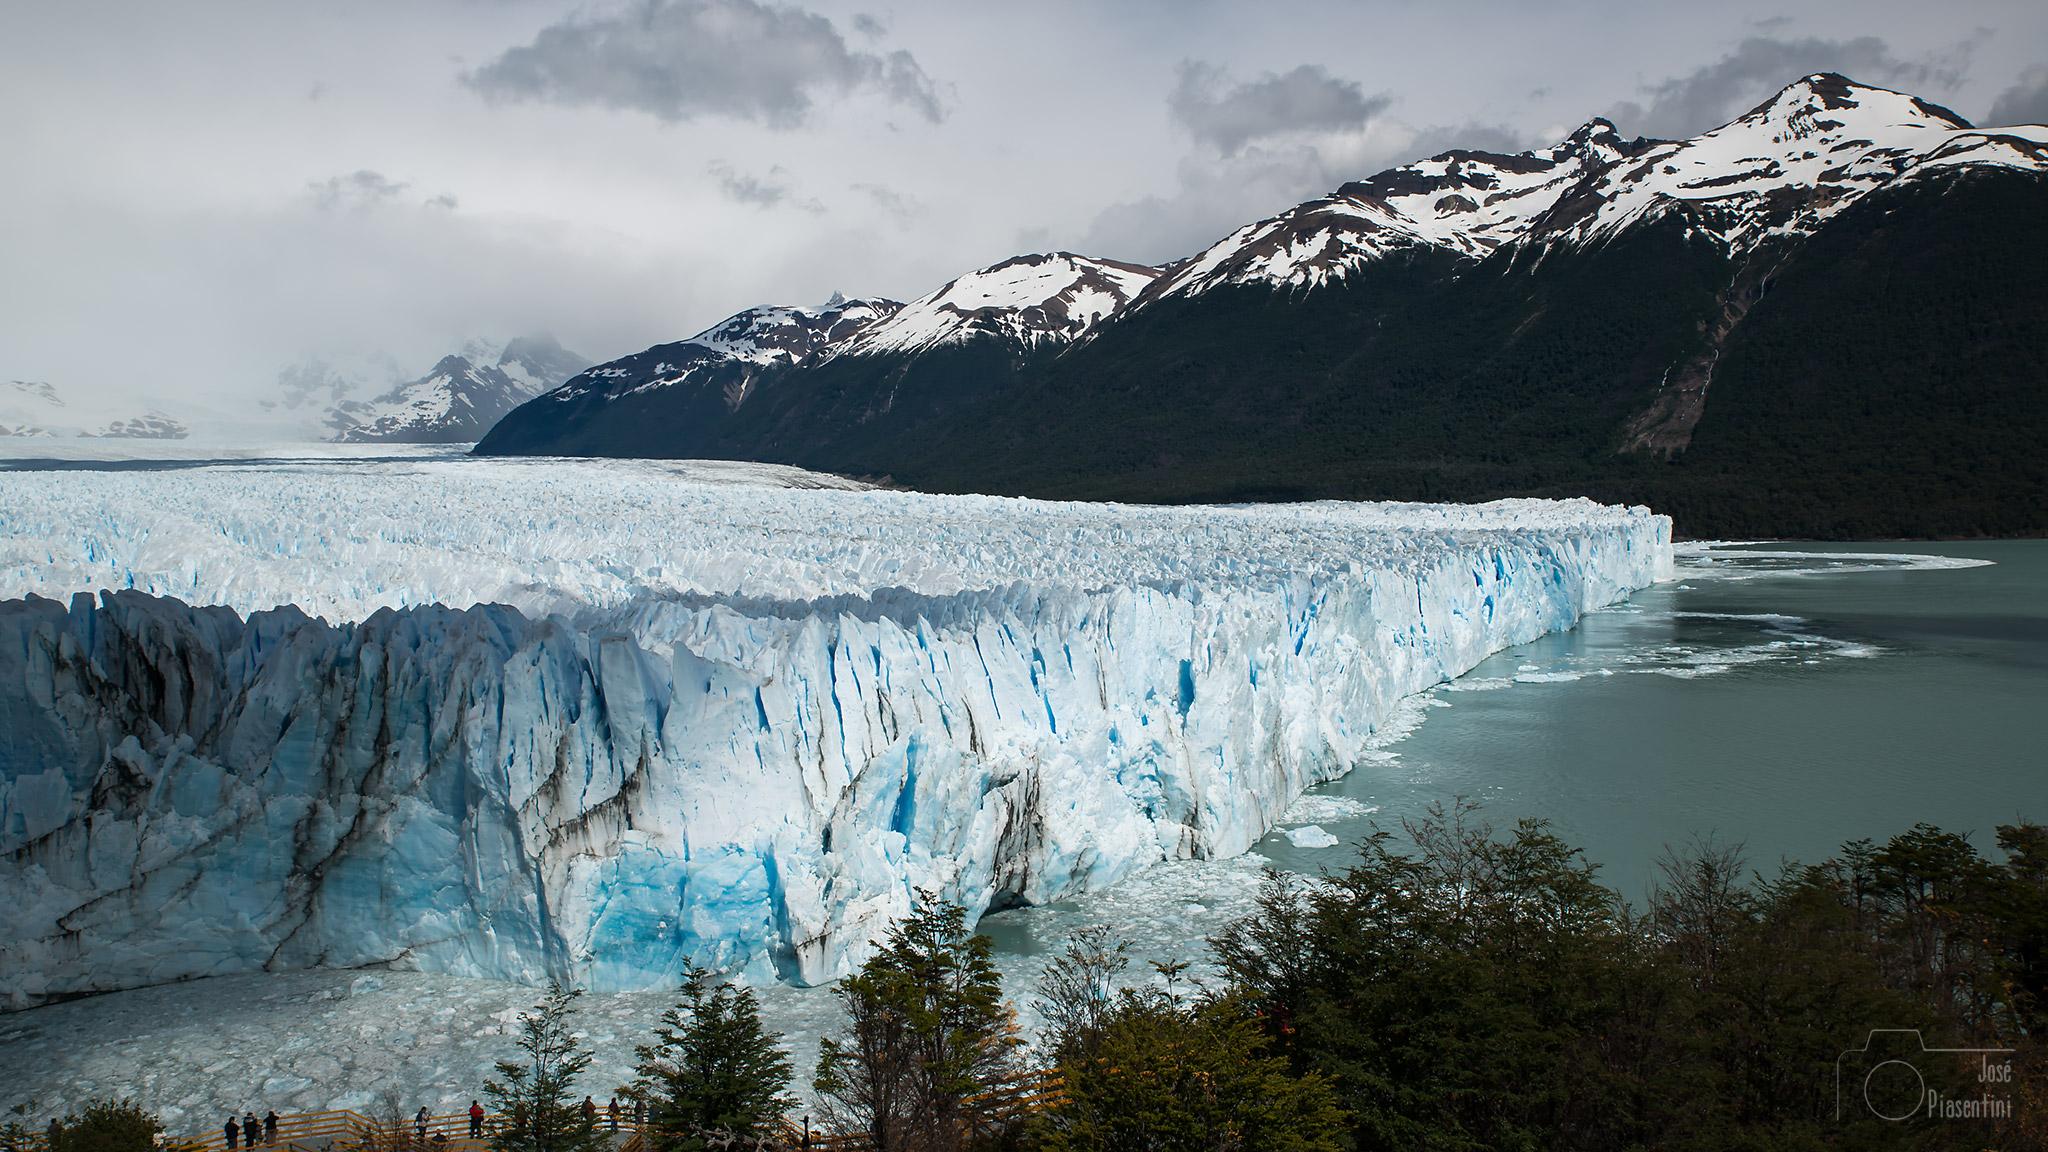 Patagonia Argentina - el Calafate - Glaciar Perito Moreno